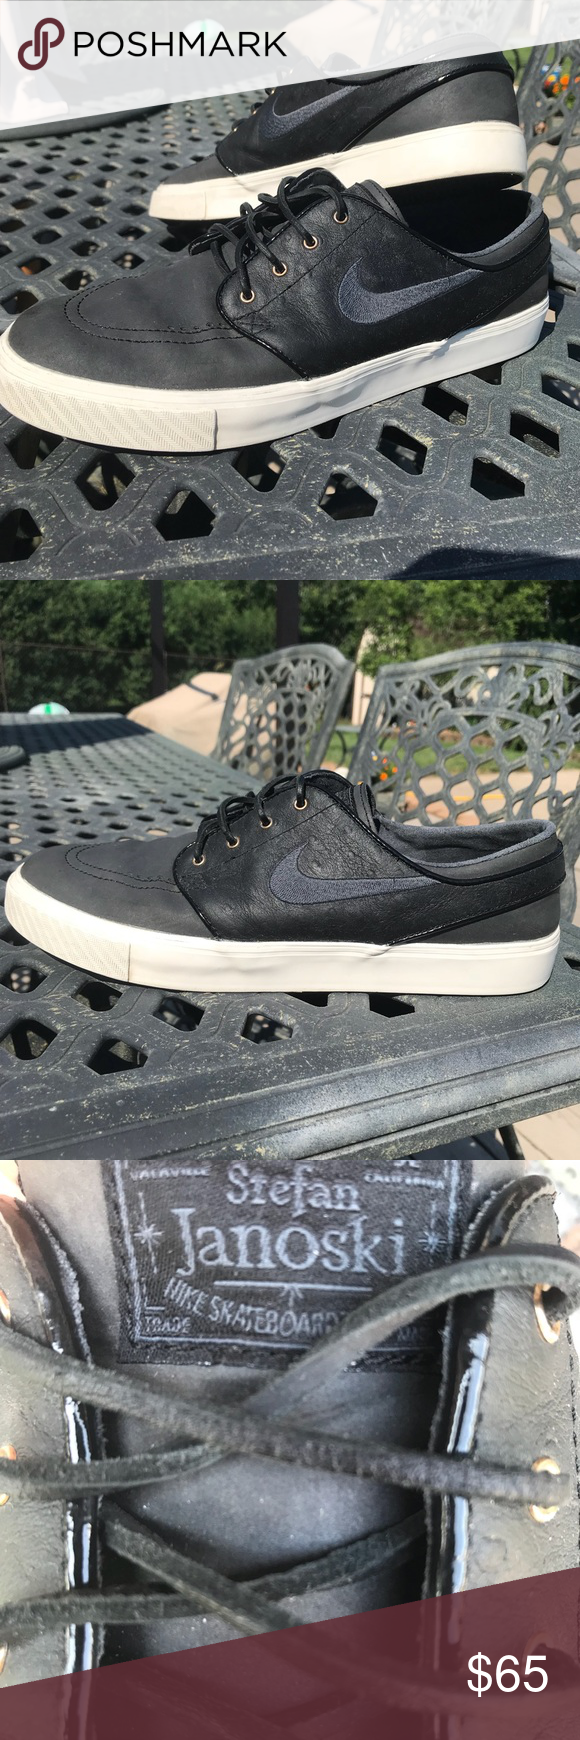 0b3c3e9e61e8 Nike SB Zoom Stephan Janoski Premium Shoes ➖Used ➖Great Condition ➖ Stefan  Janoskis Pro